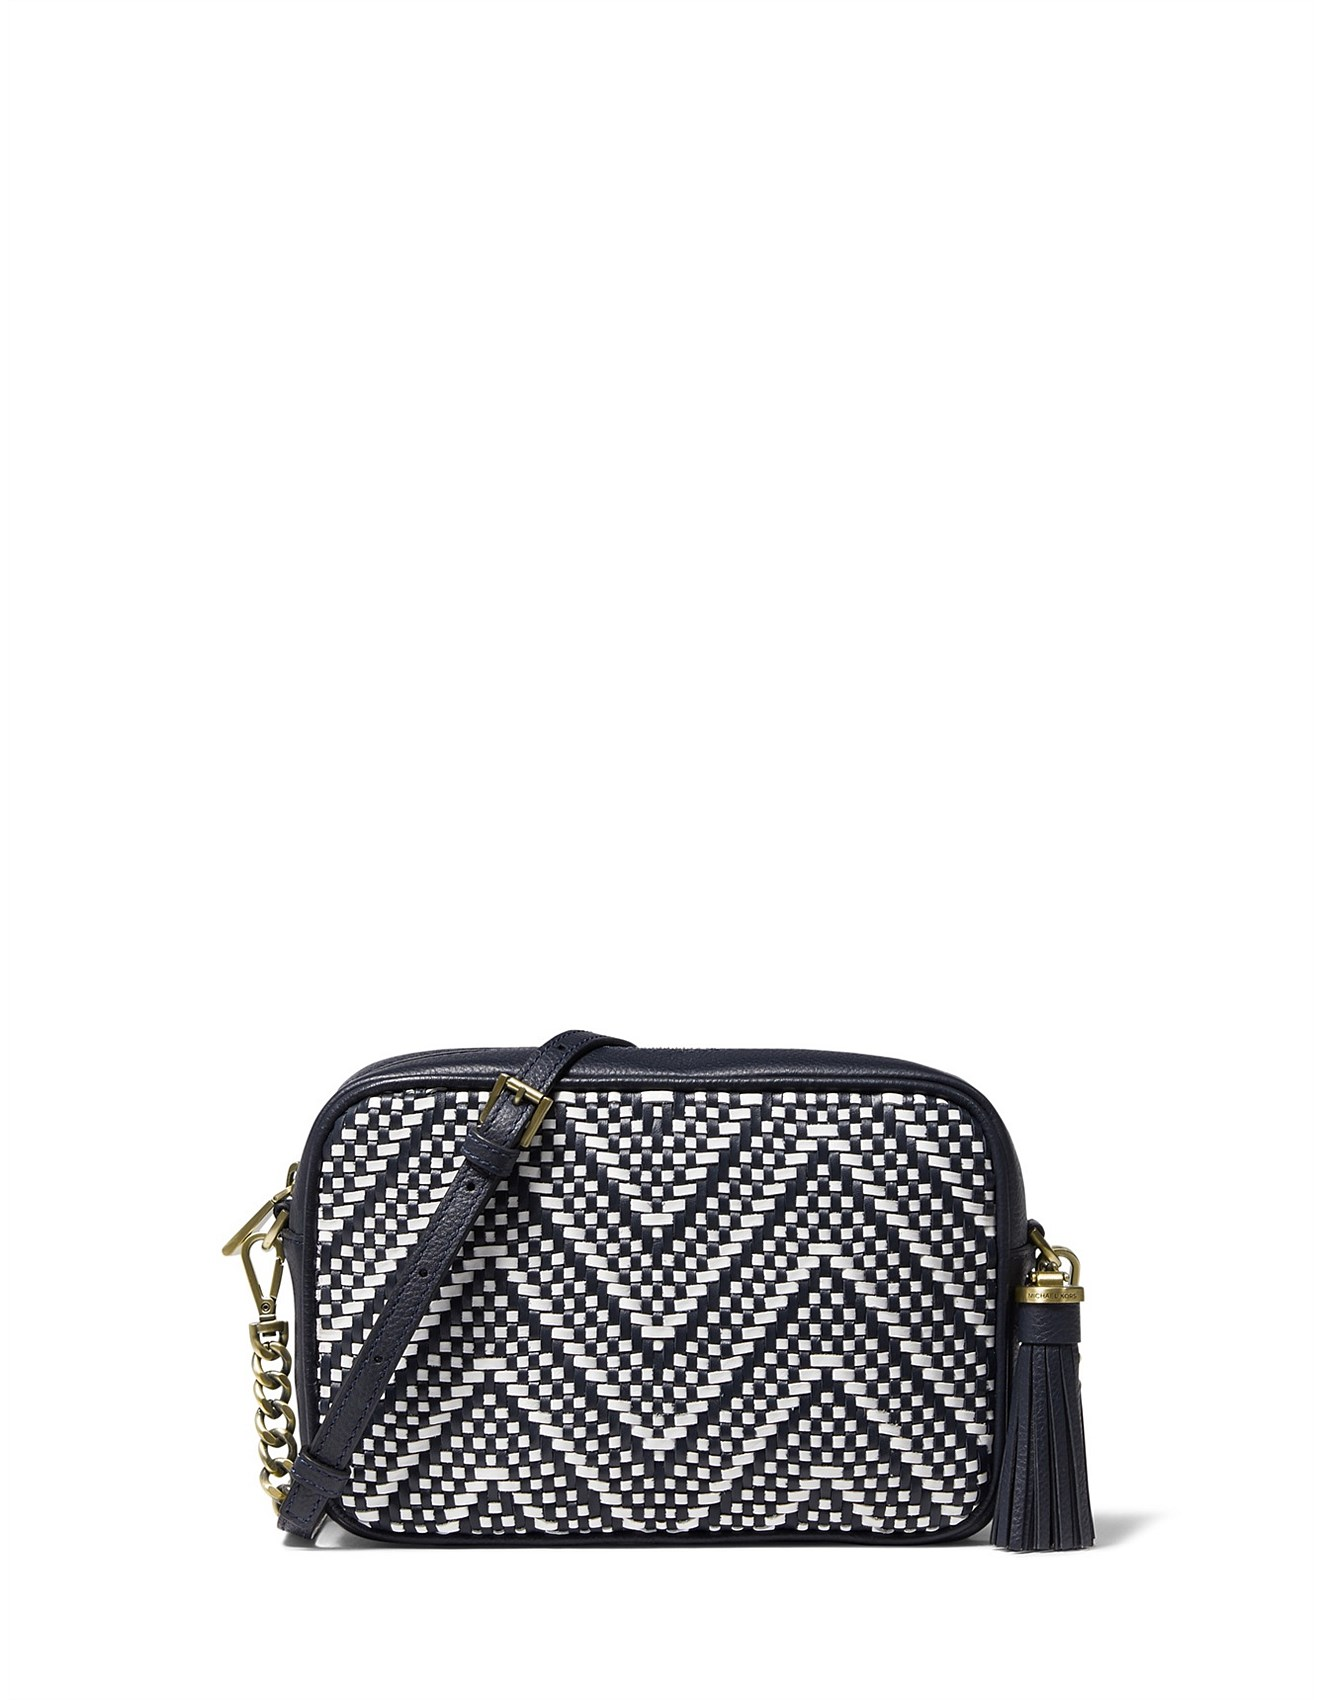 b0a8366fe Wallets - Ginny Medium Bicolor Woven Leather Crossbody